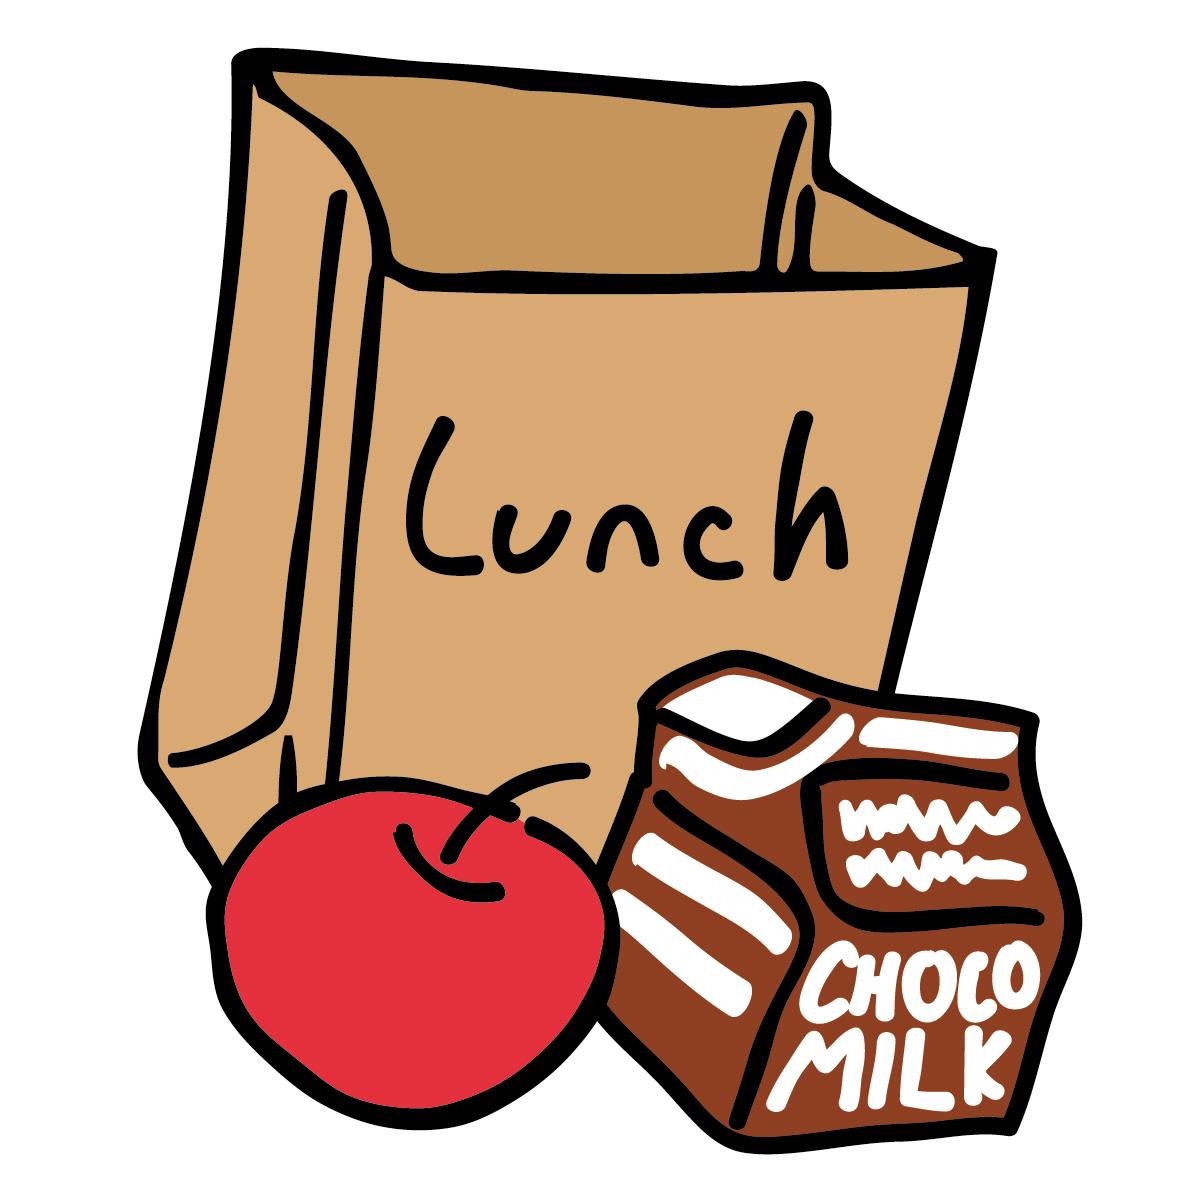 1200x1200 20 School Lunch Clipart. Clipart Panda